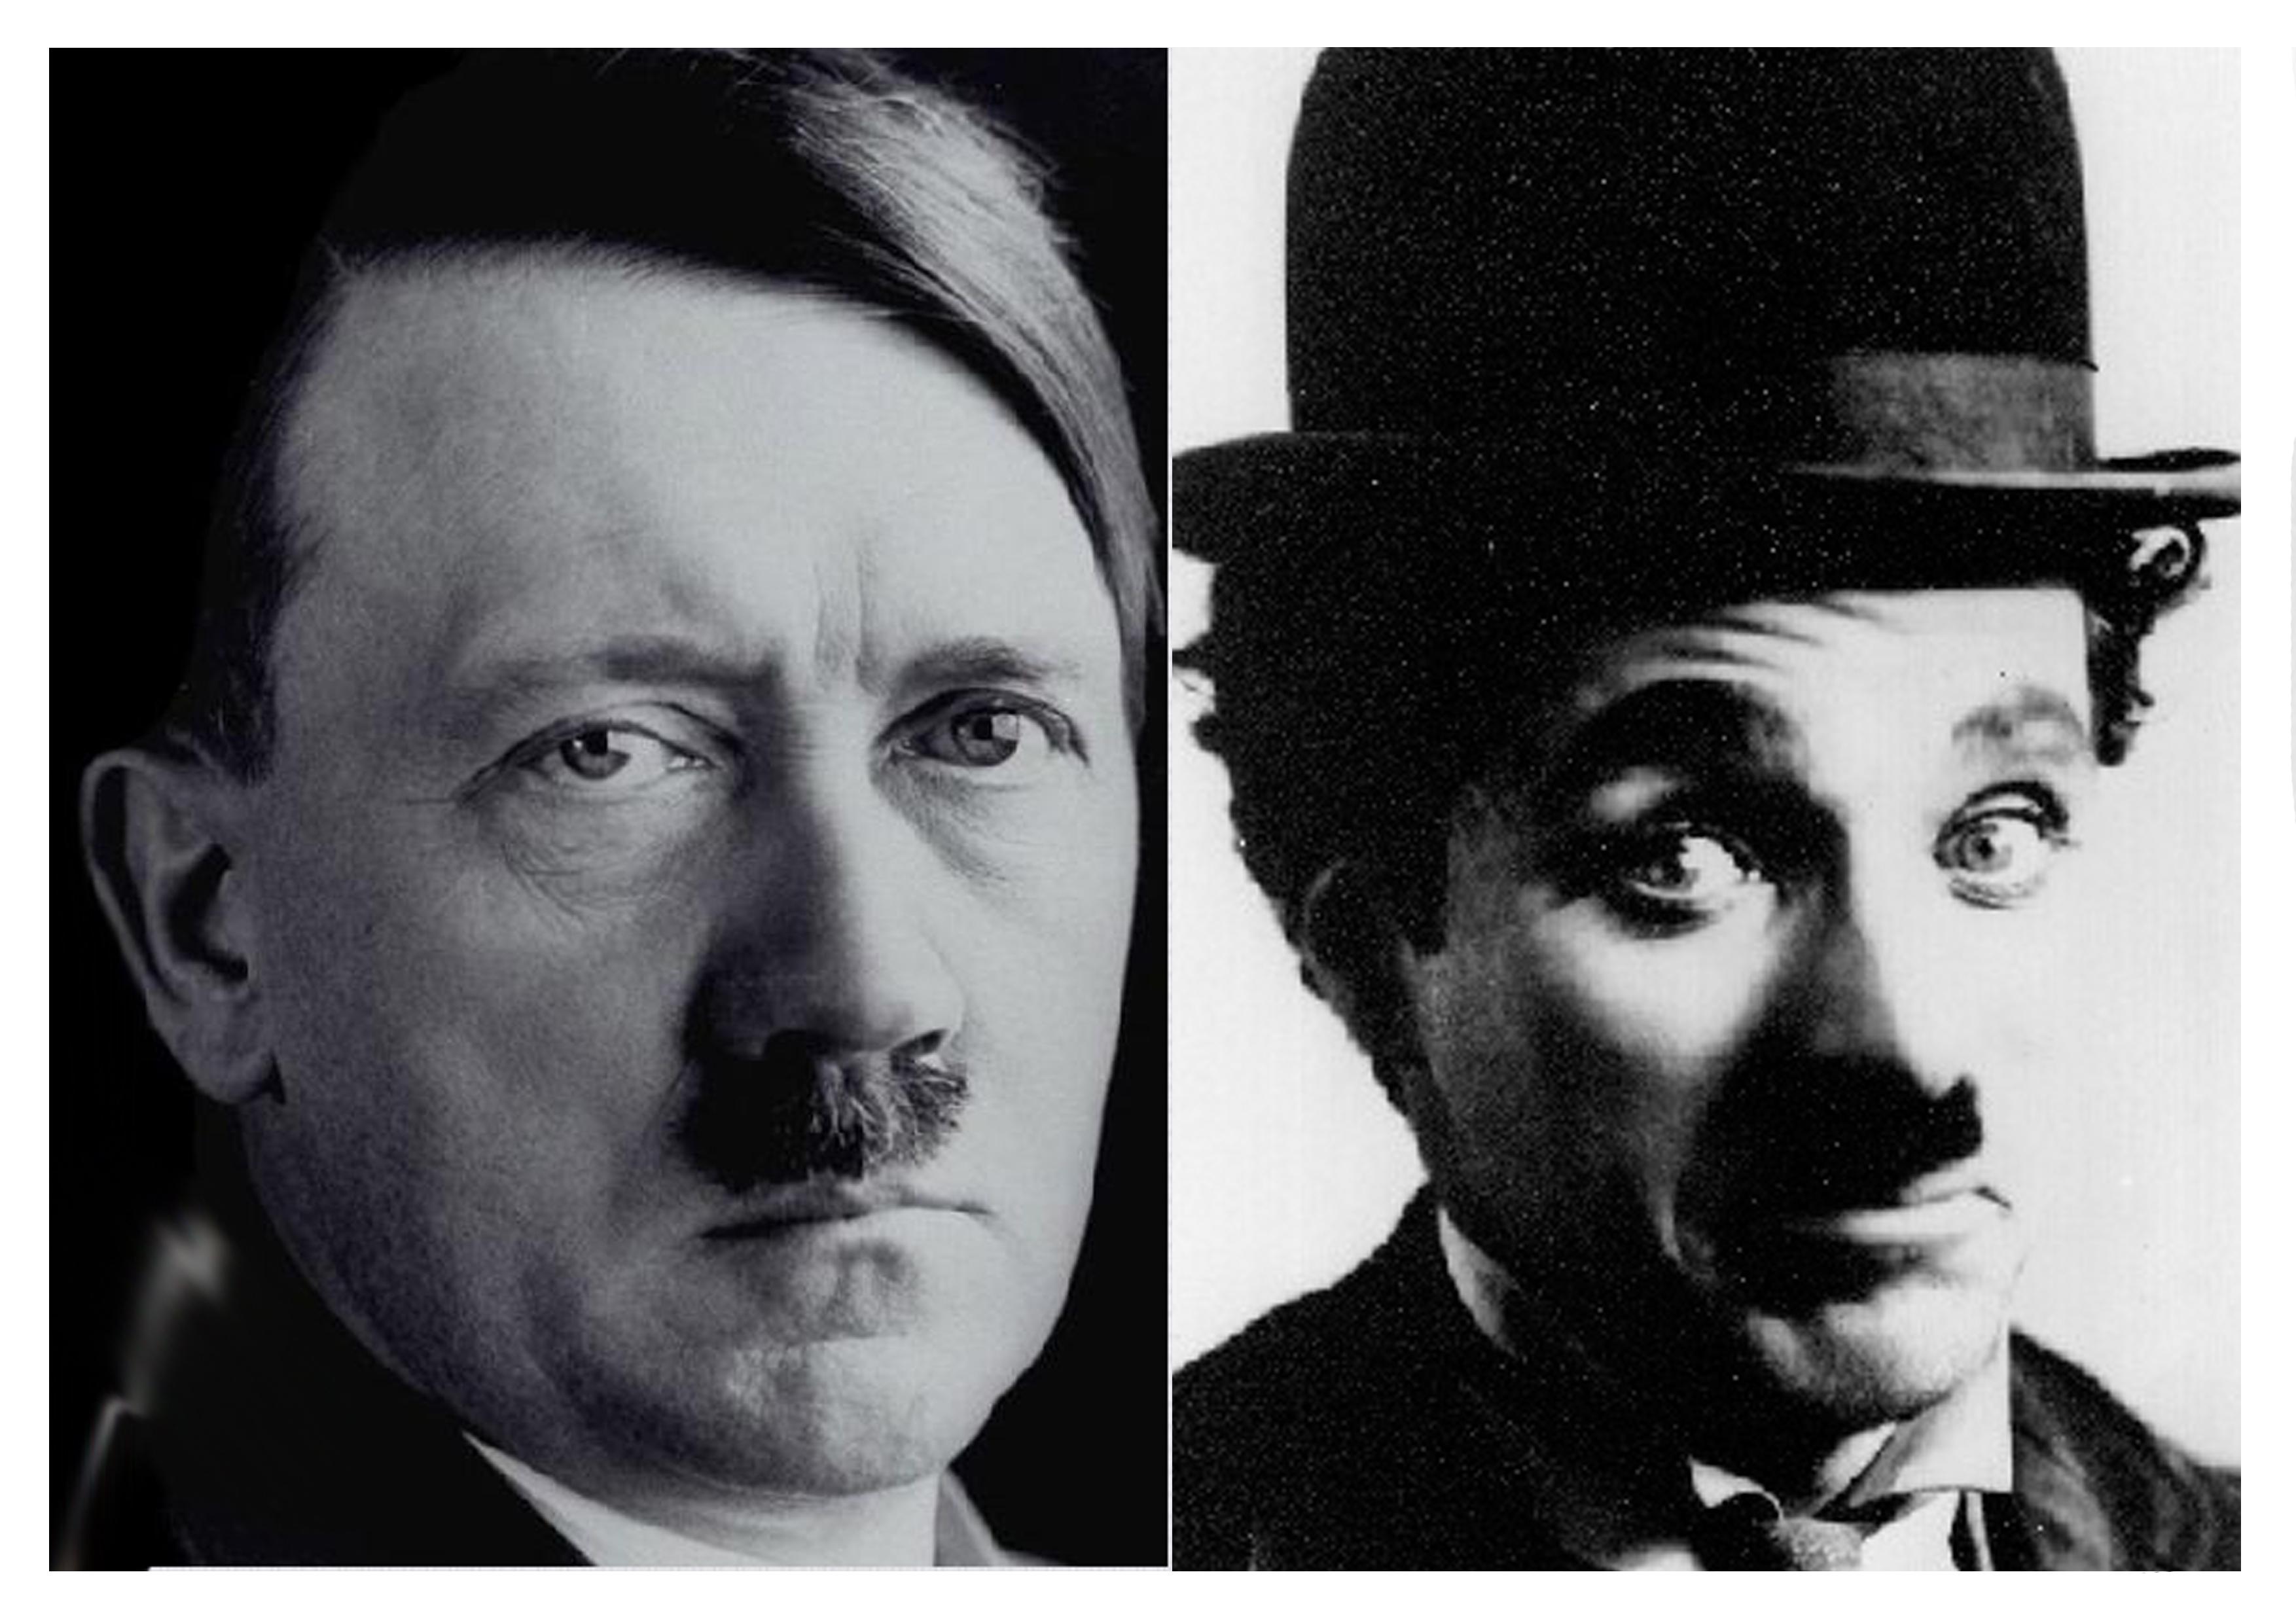 Charlie Chaplin VS Adolf hitler, Siapa Meniru Siapa?